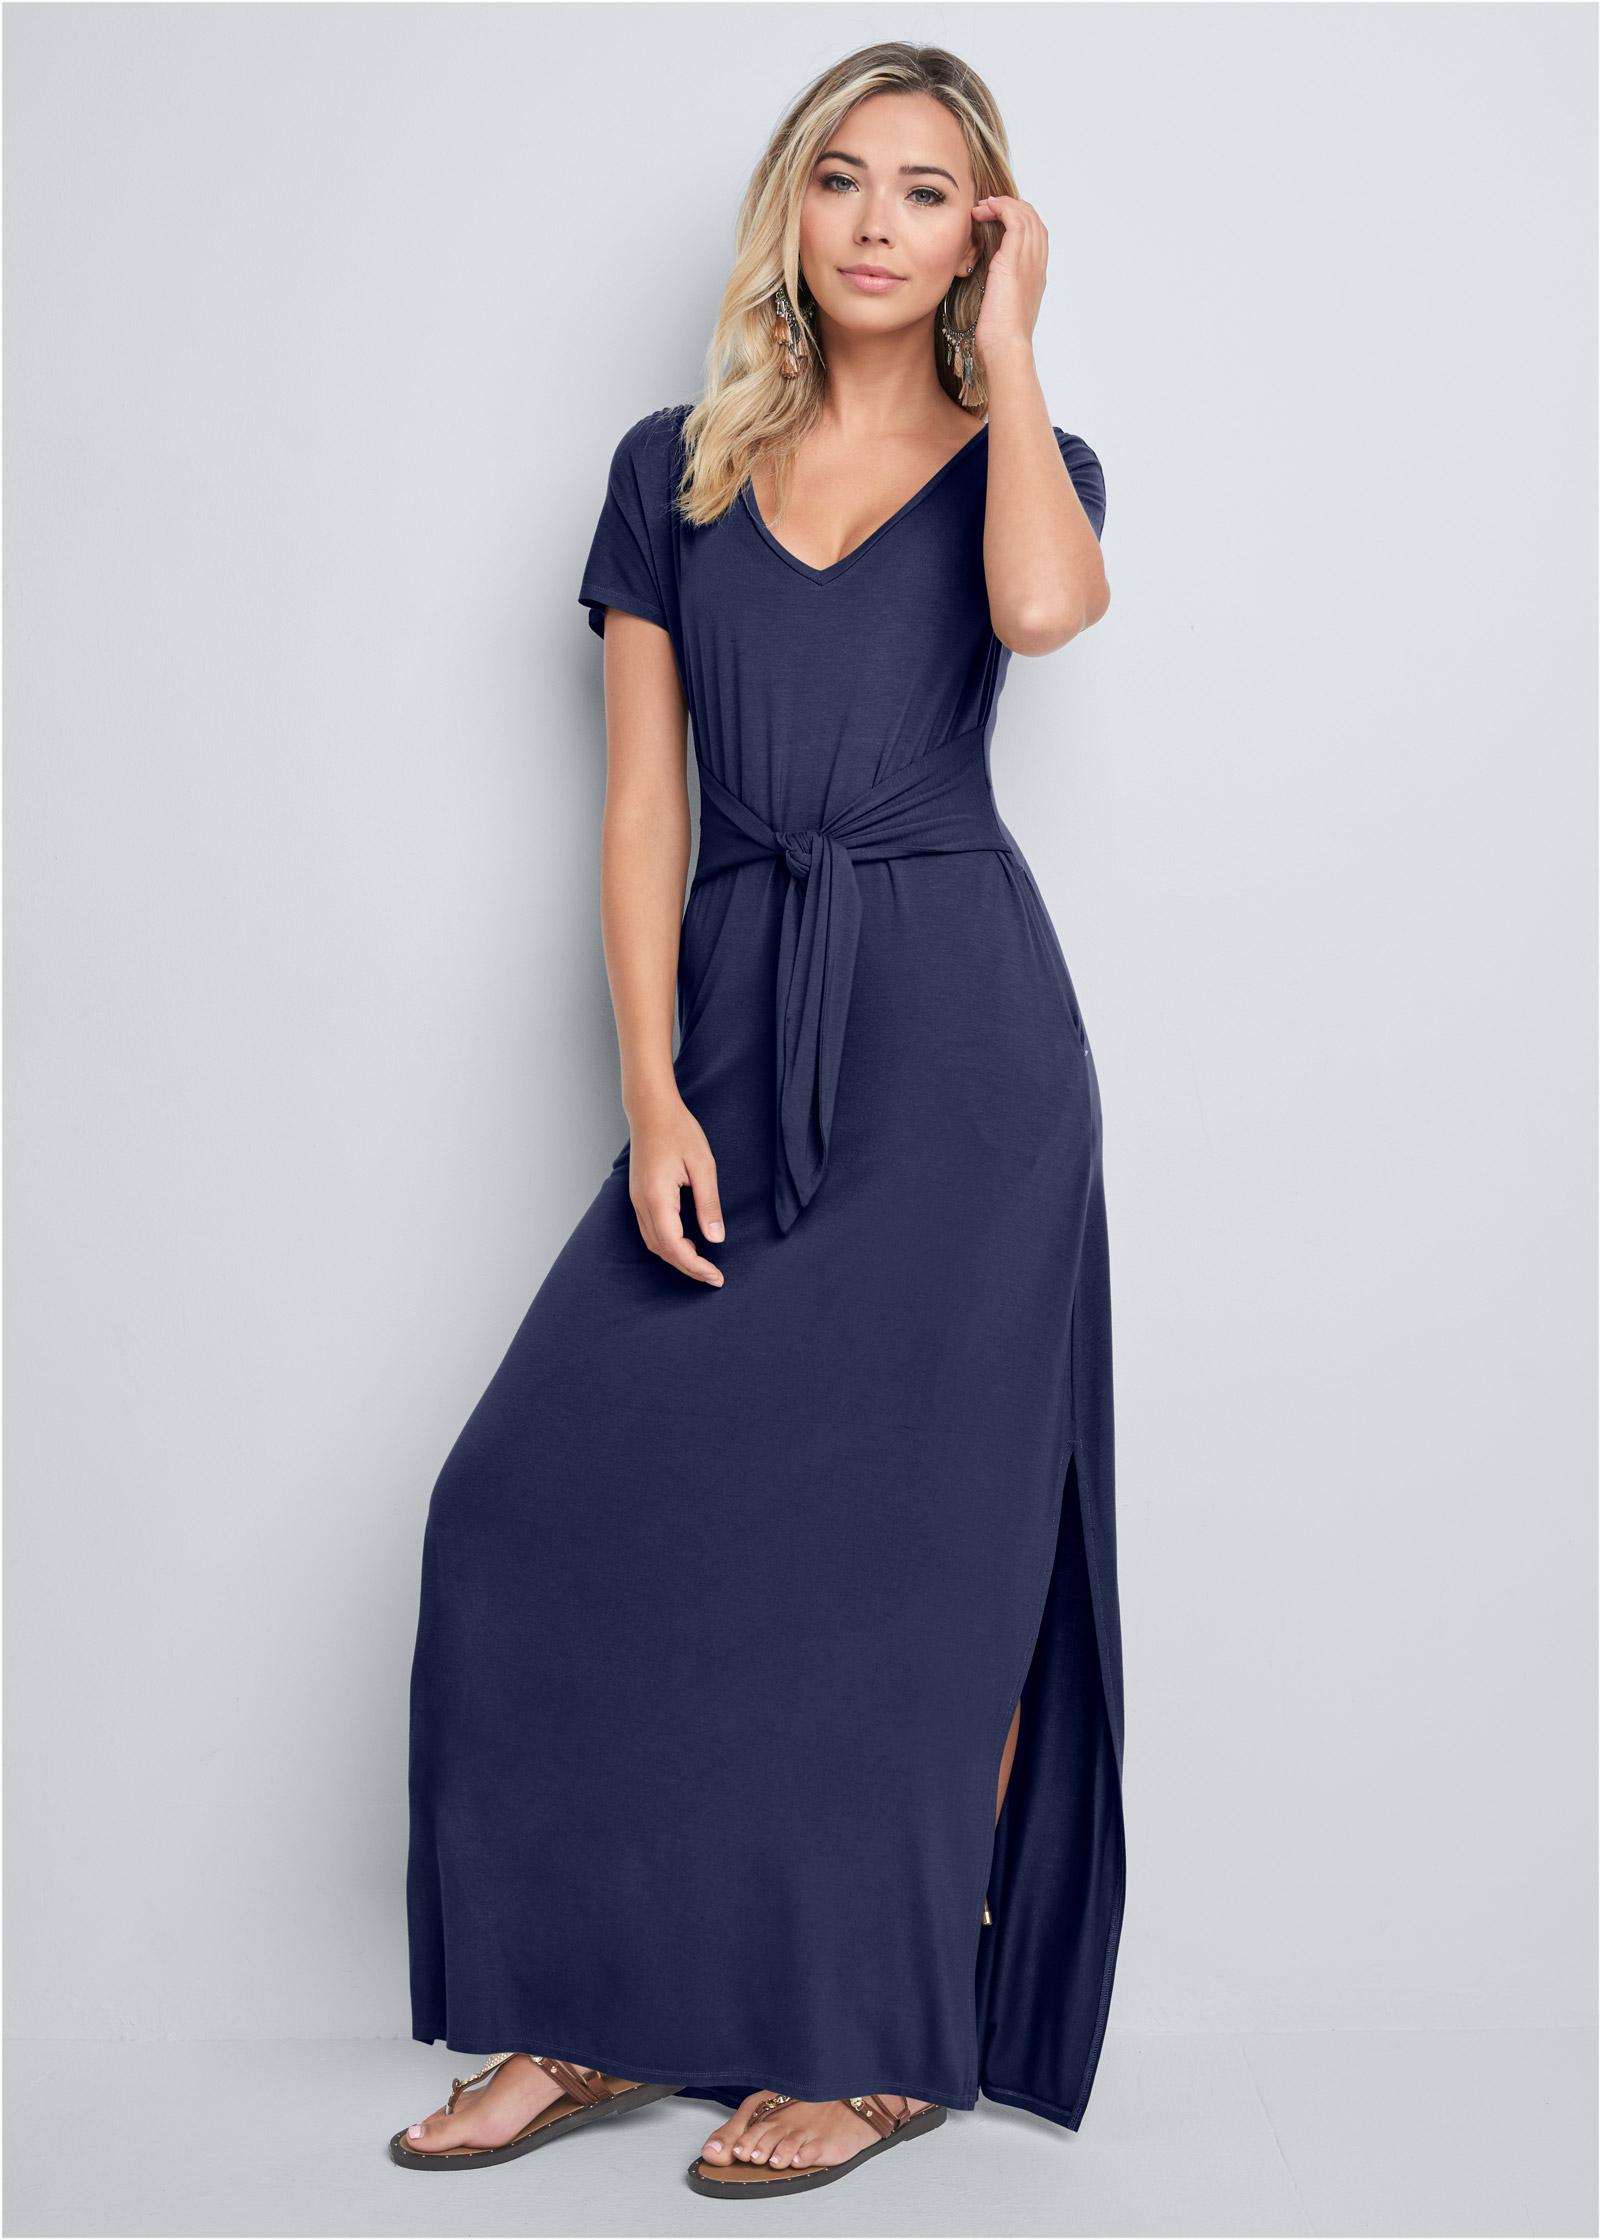 TIE FRONT V-NECK MAXI DRESS